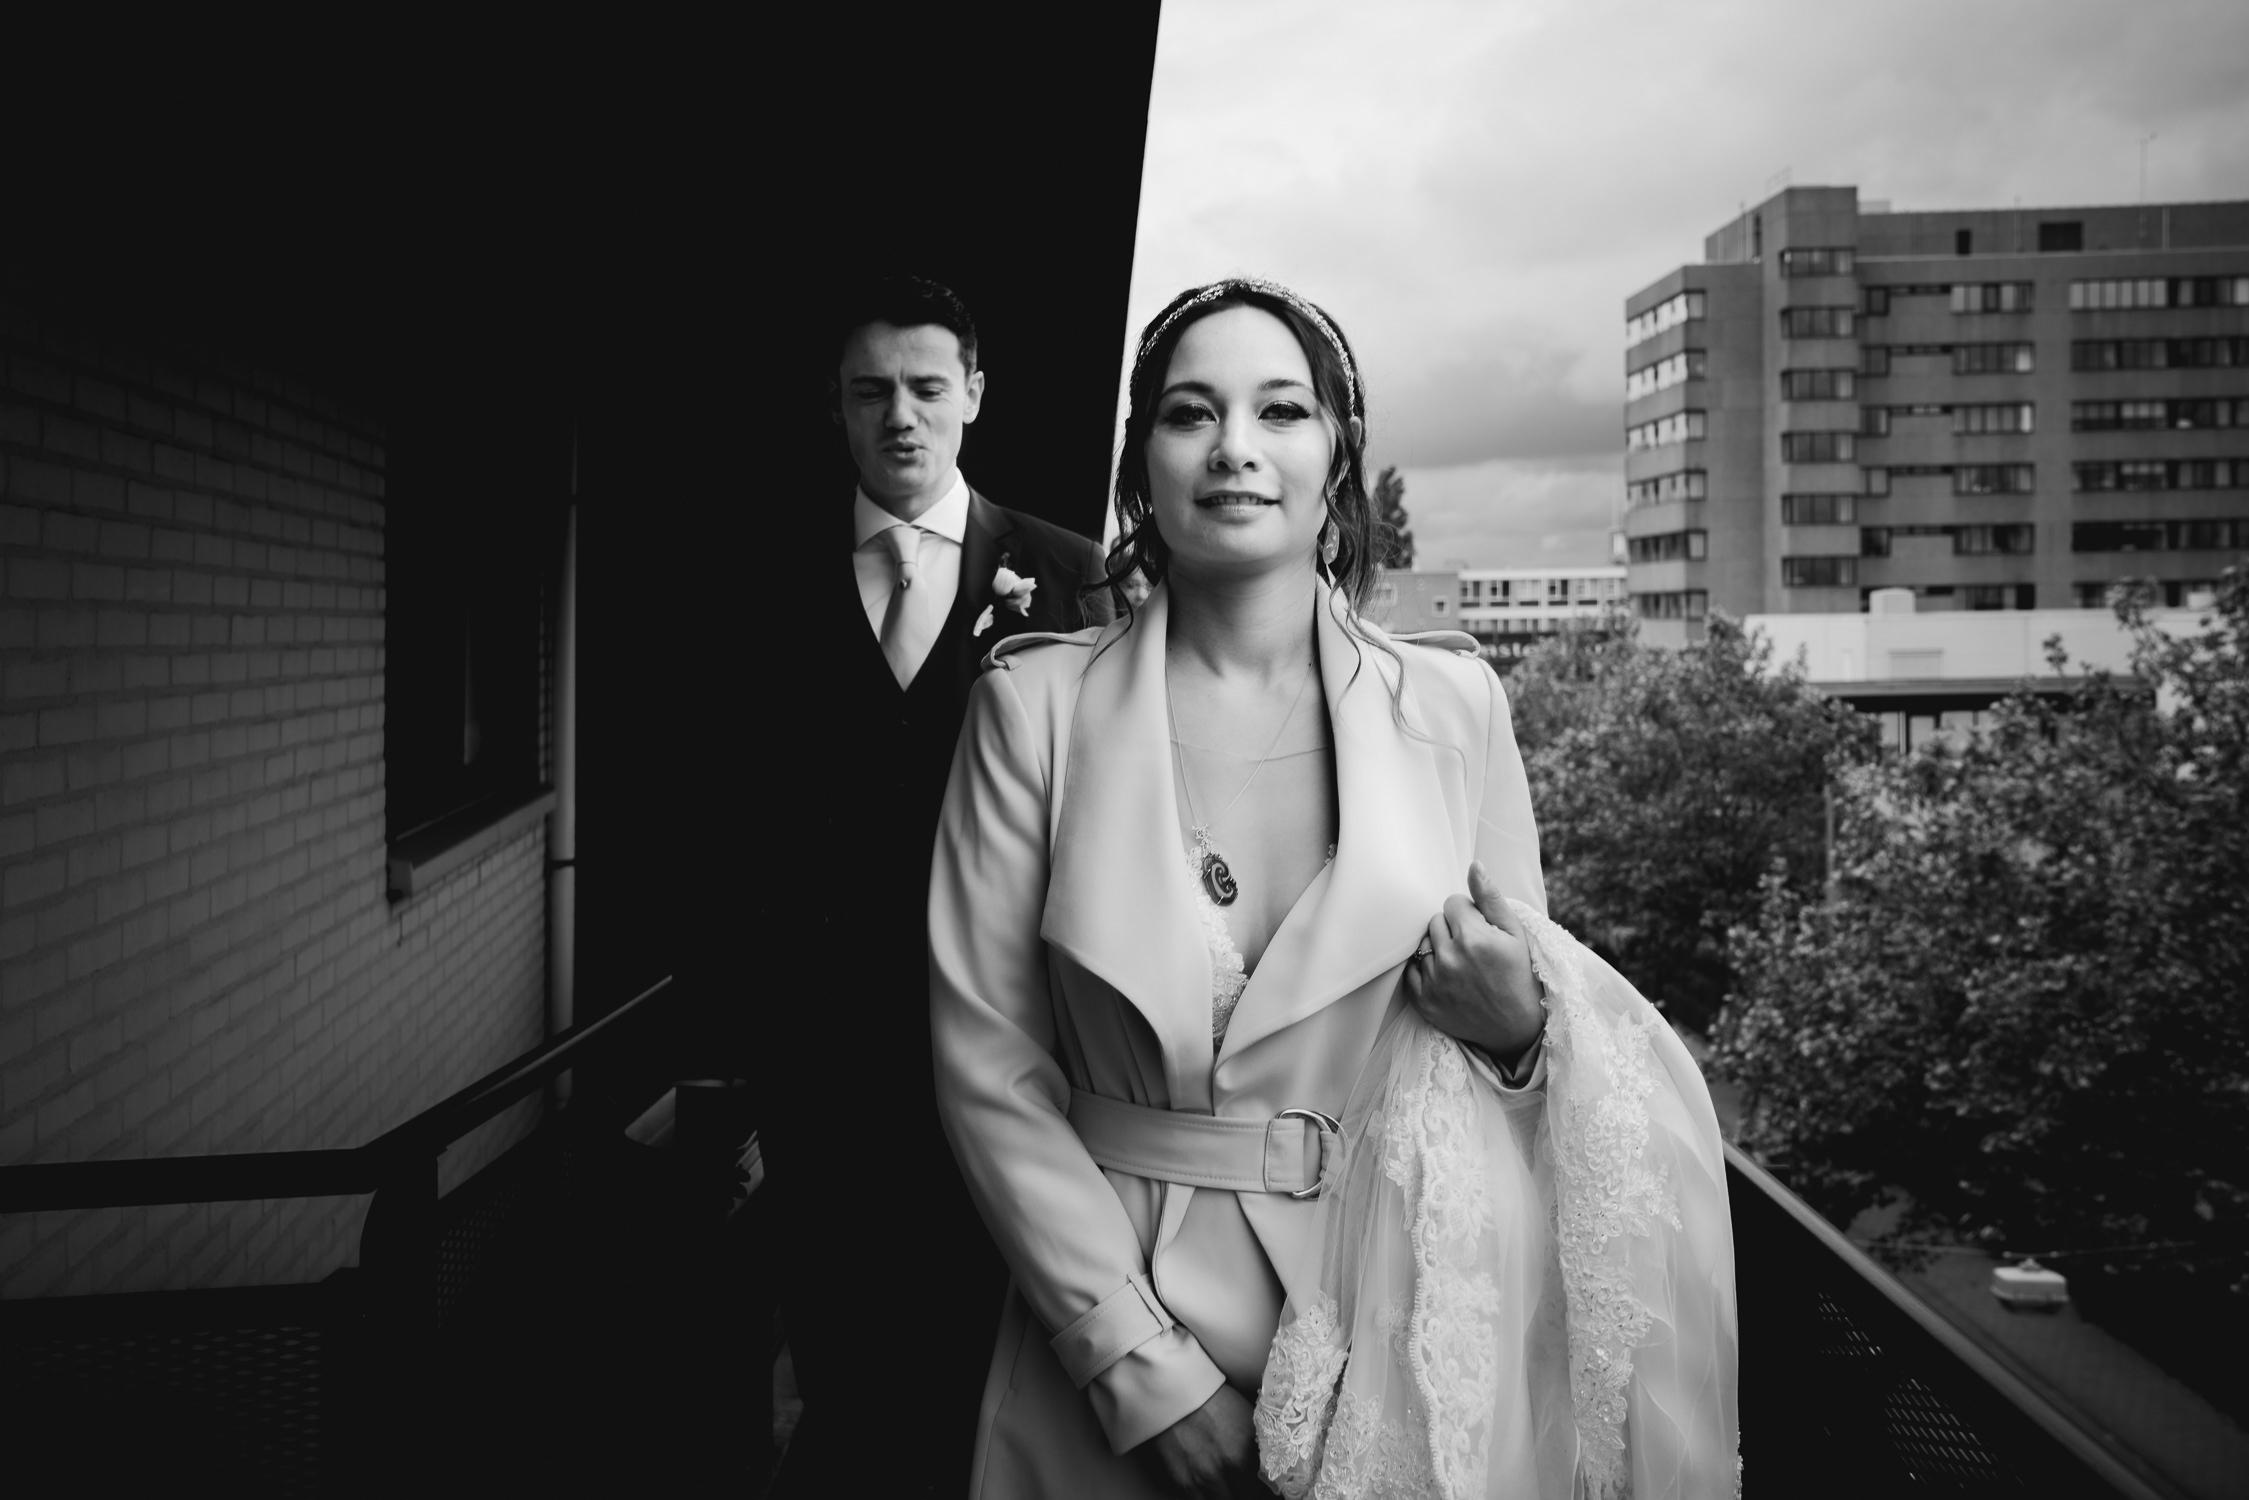 bruidsfotografie-amsterdam-utrecht-trouwfotograaf-mark-hadden-wedding-photography-Robin & Guus-016-2.jpg